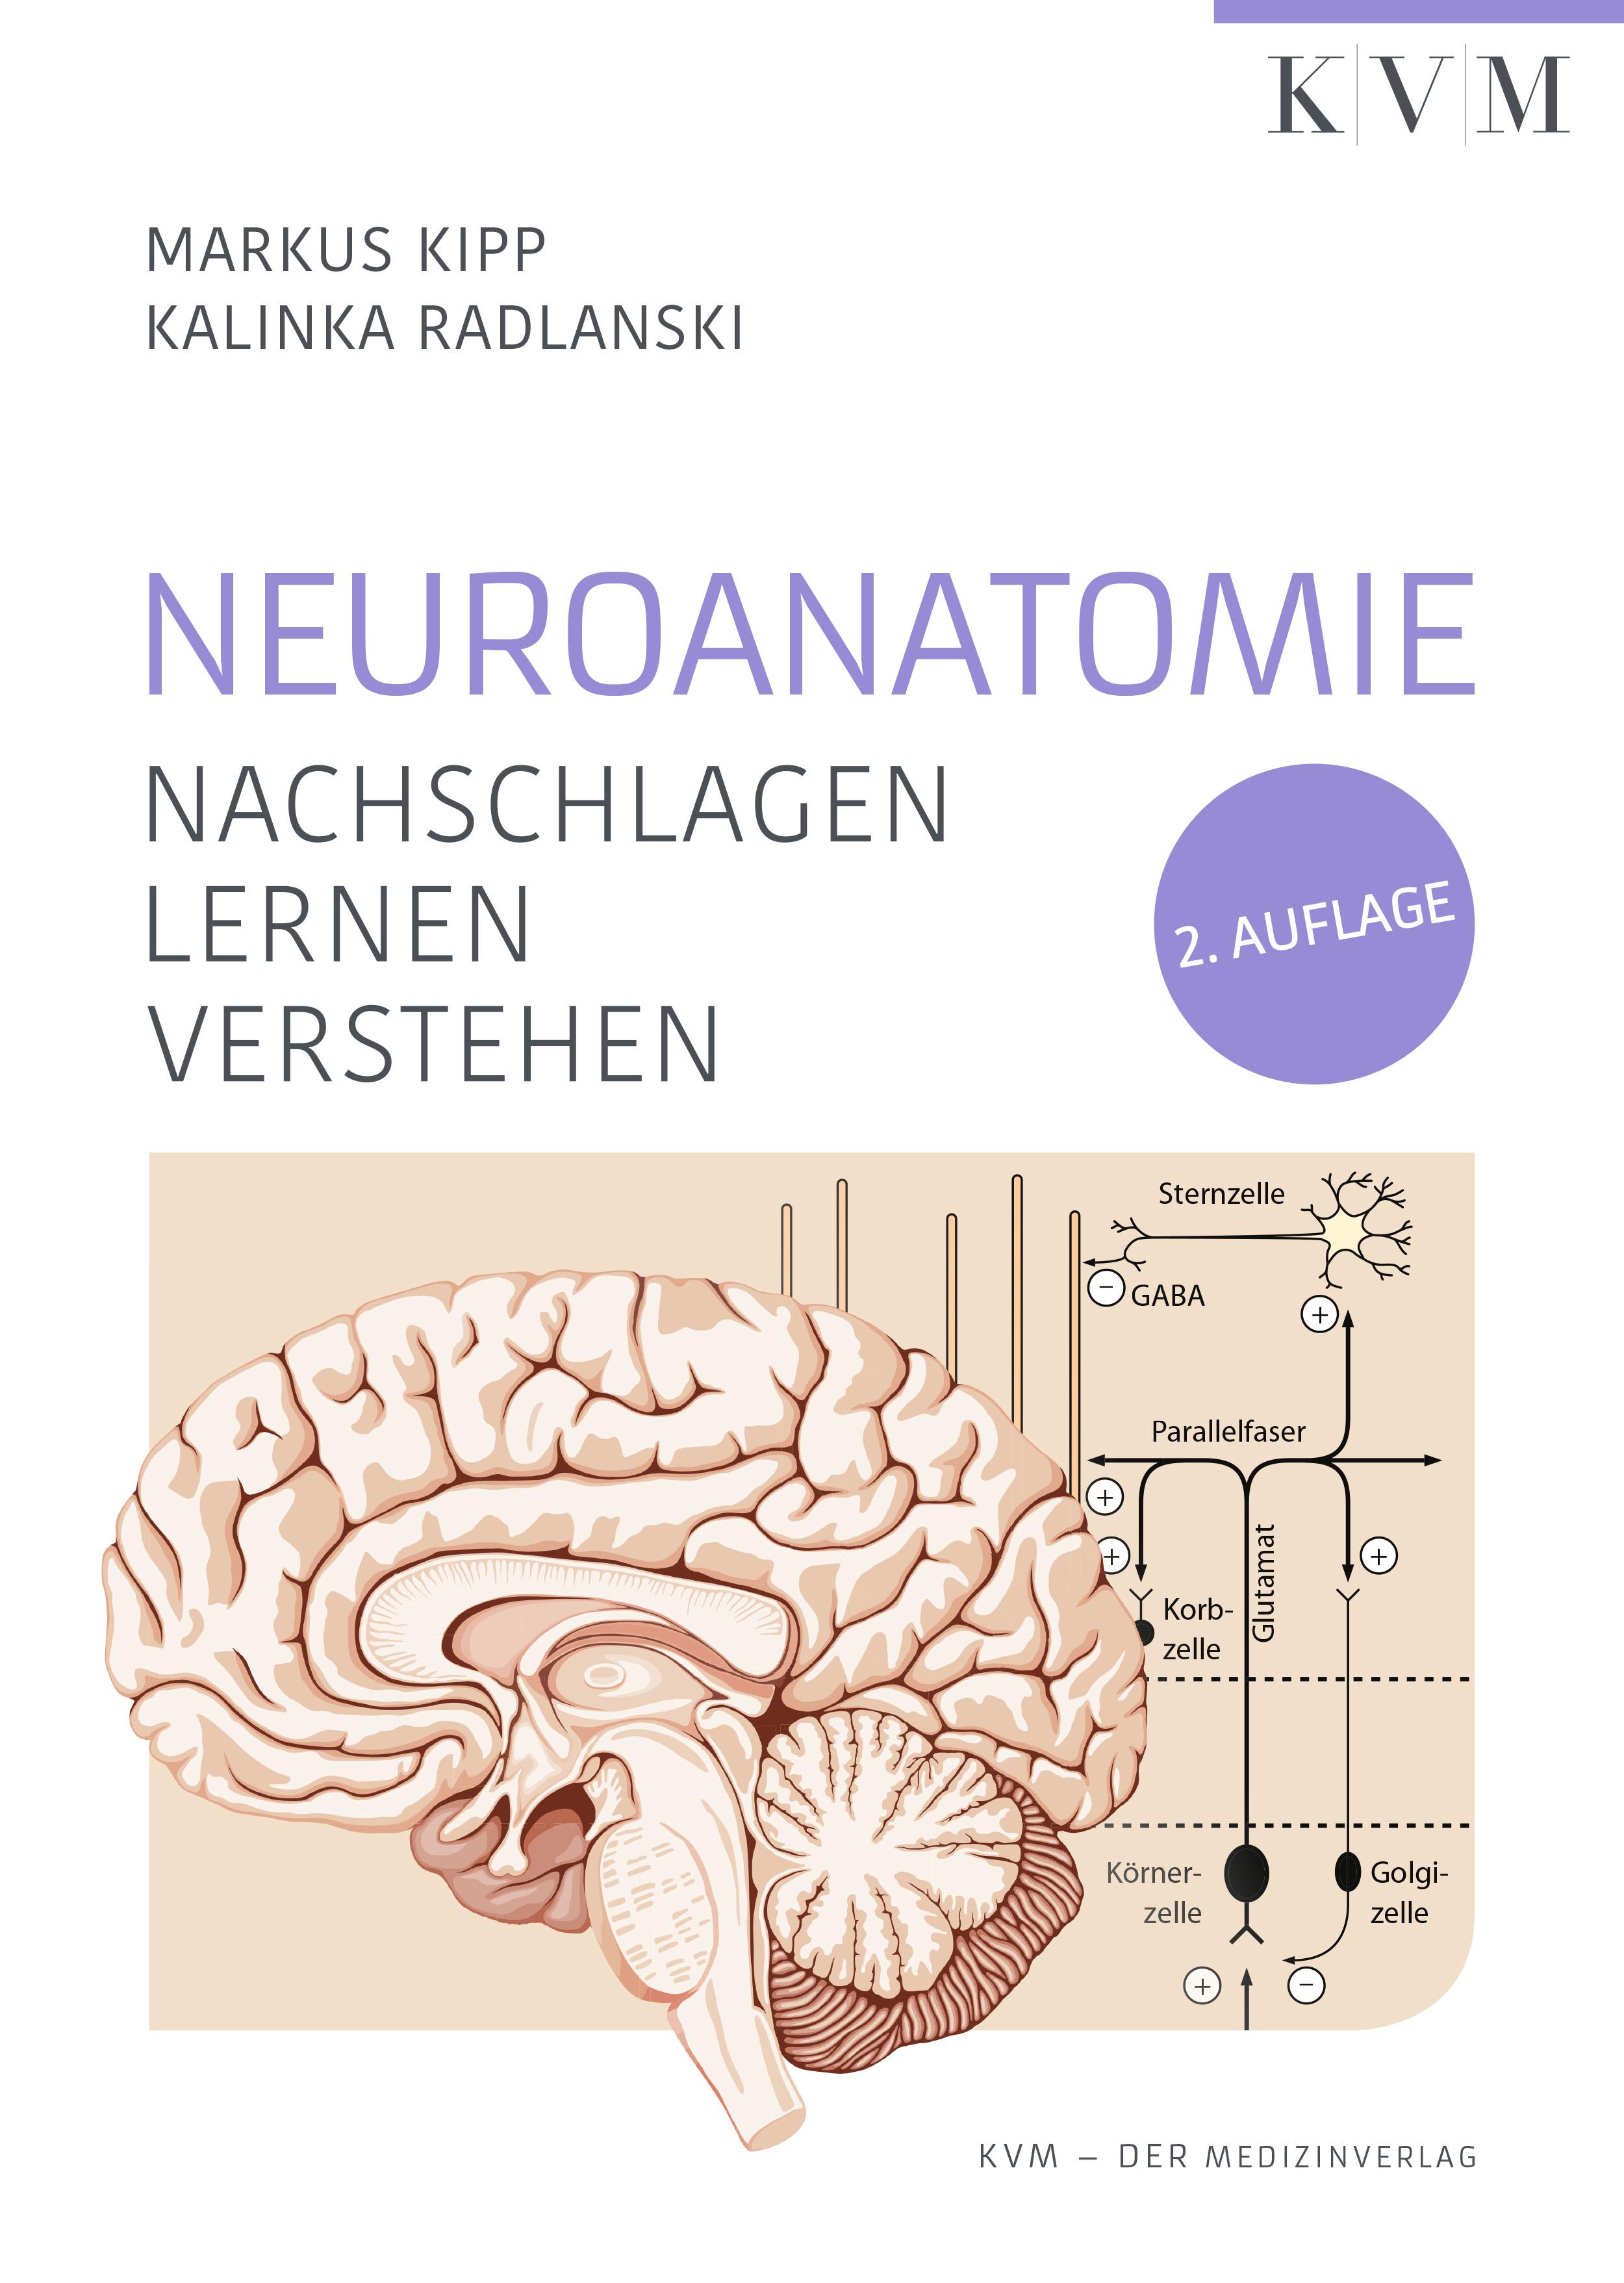 цены Markus Kipp Neuroanatomie